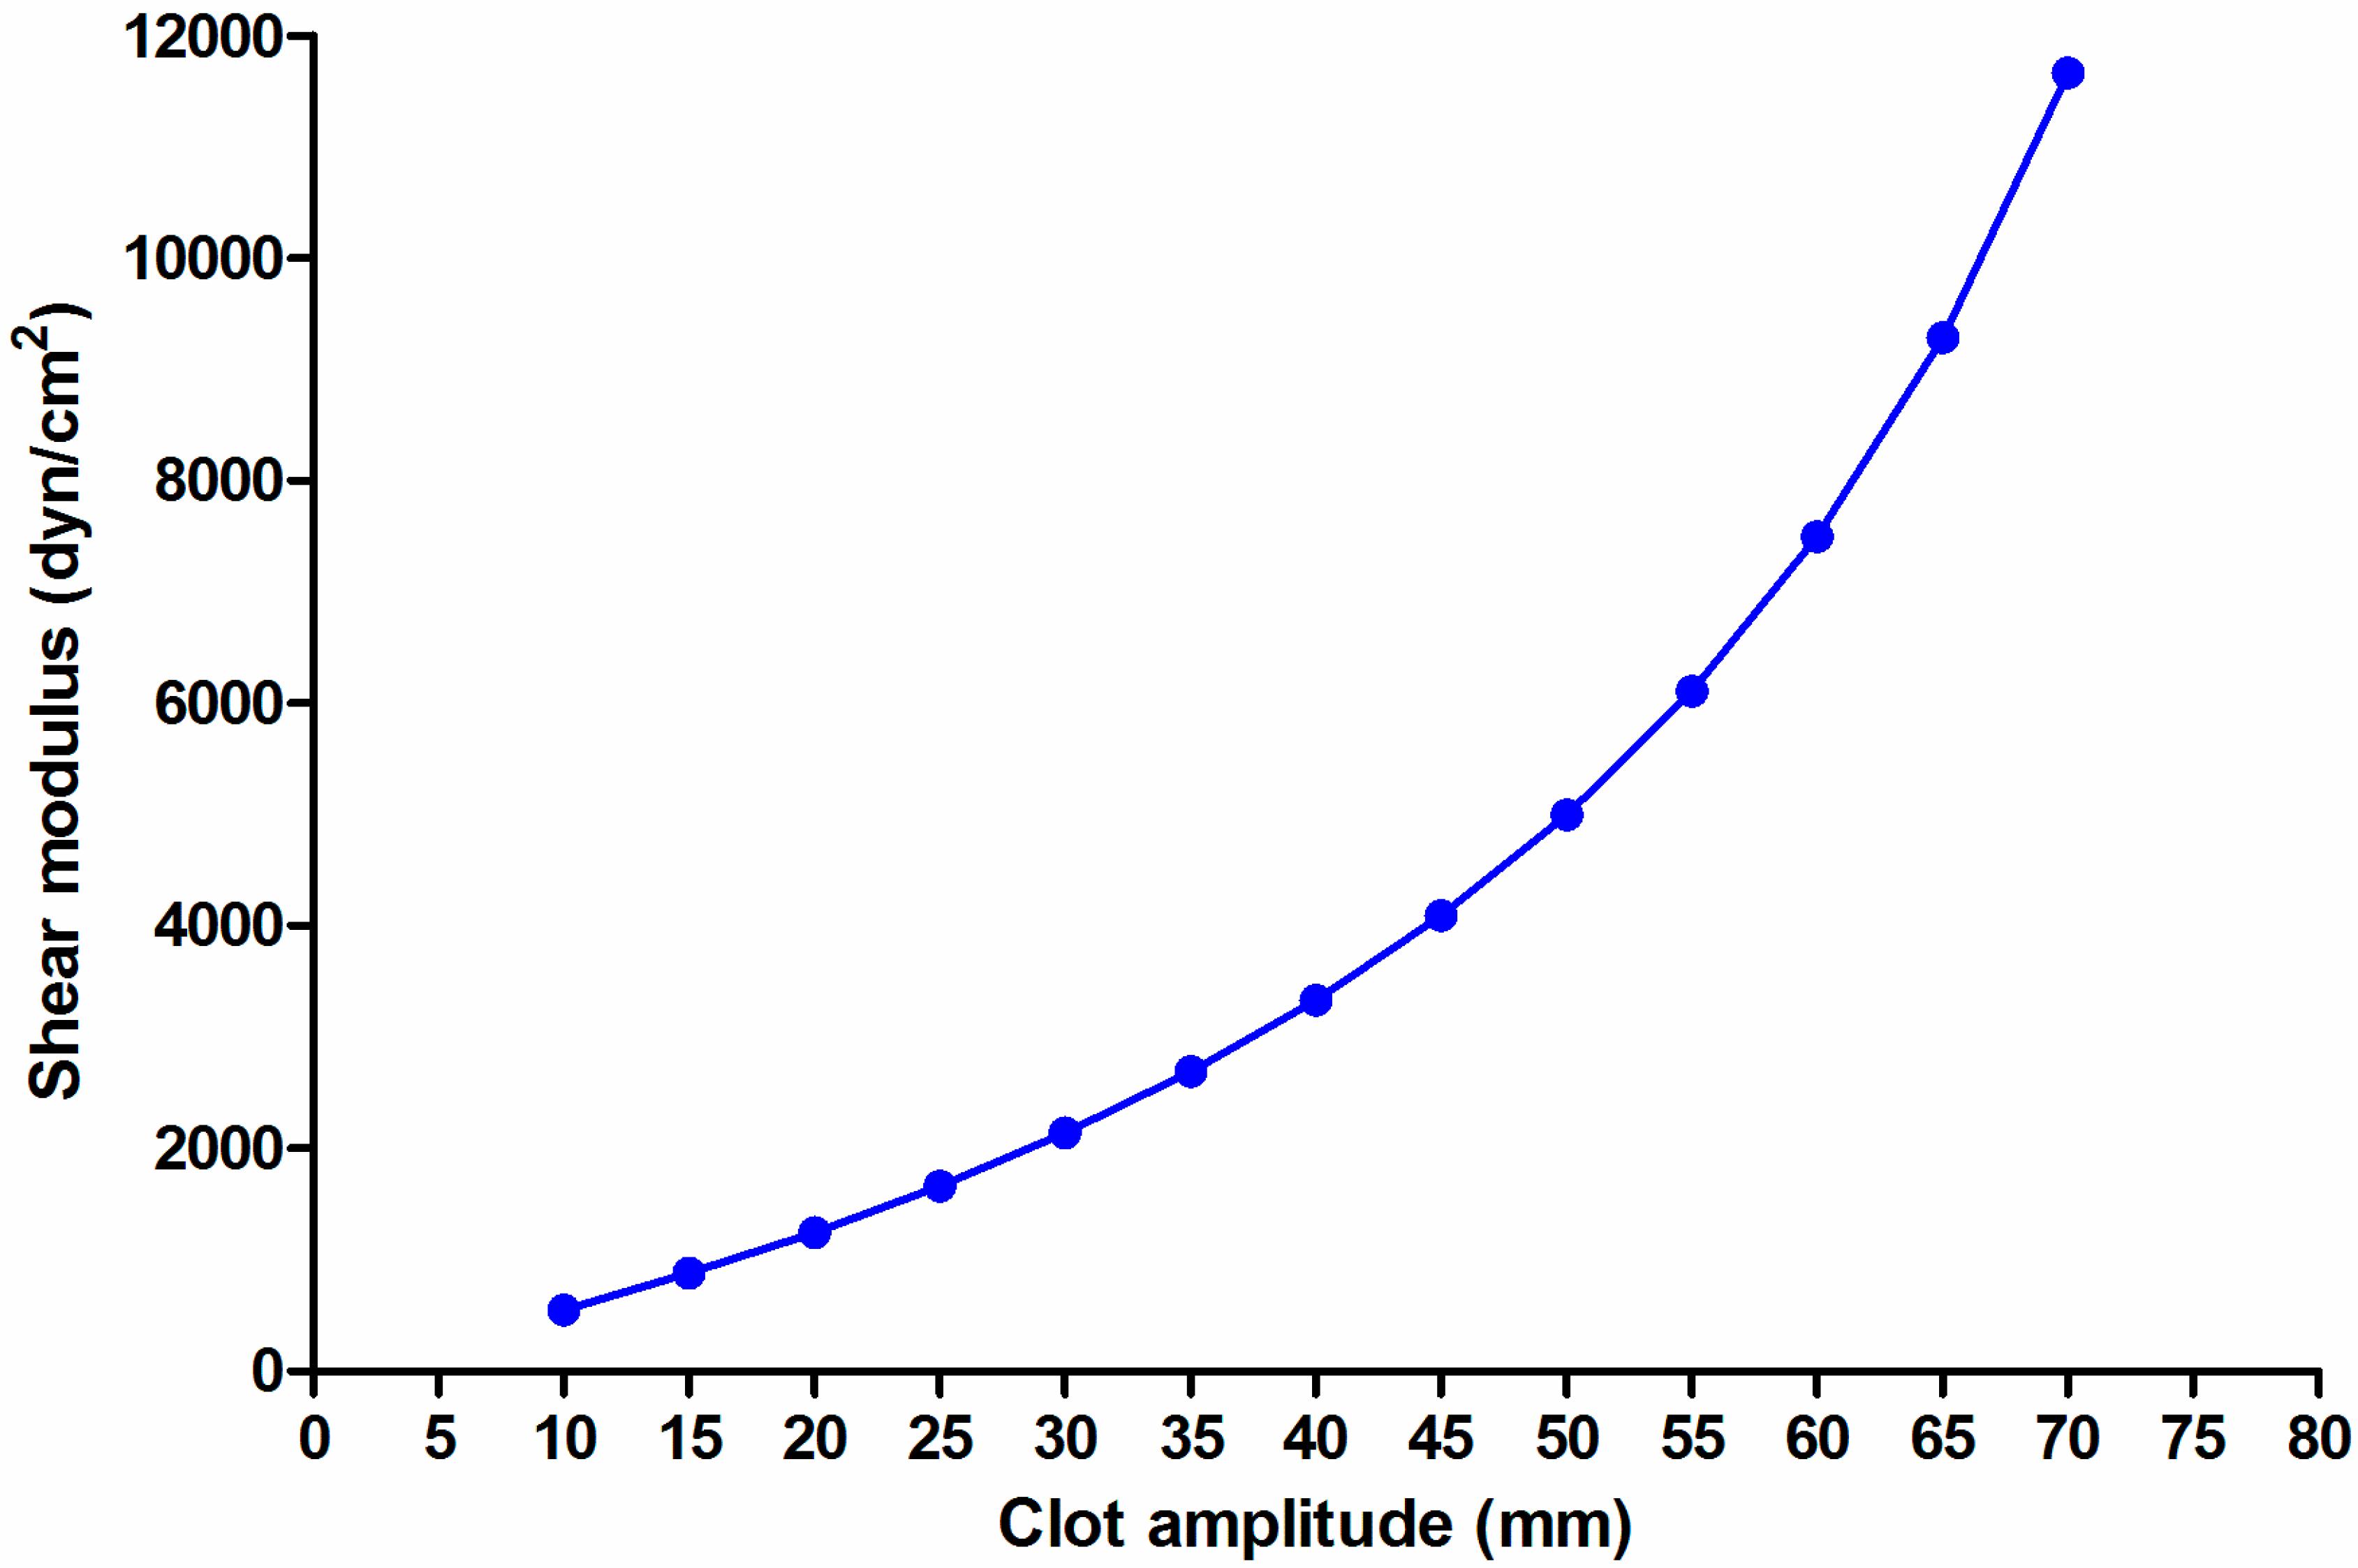 chloroquine inhibits autophagic flux by decreasing autophagosome-lysosome fusion